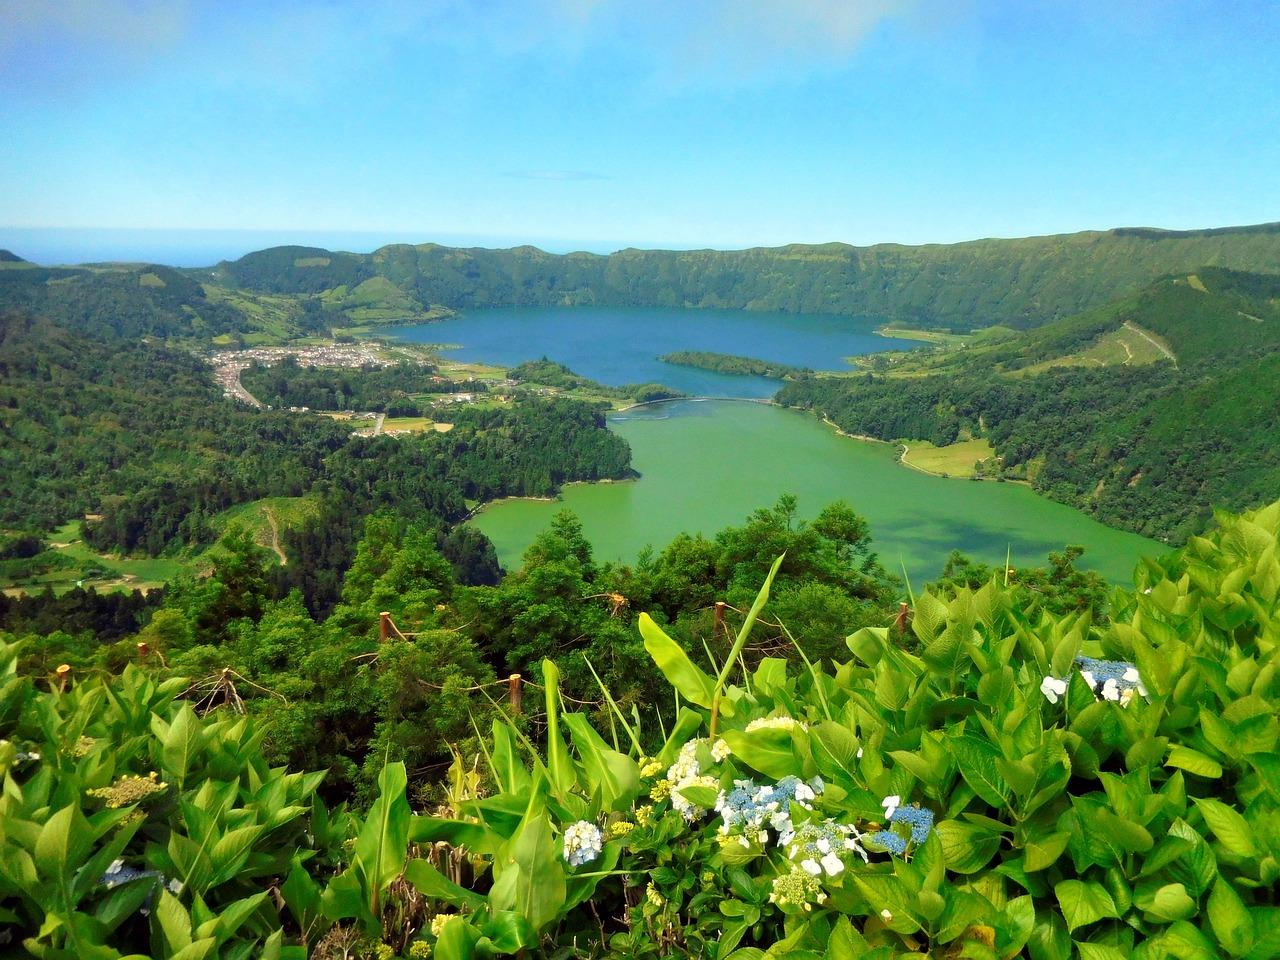 Sete Cidades in São Miguel Island © Pixabay